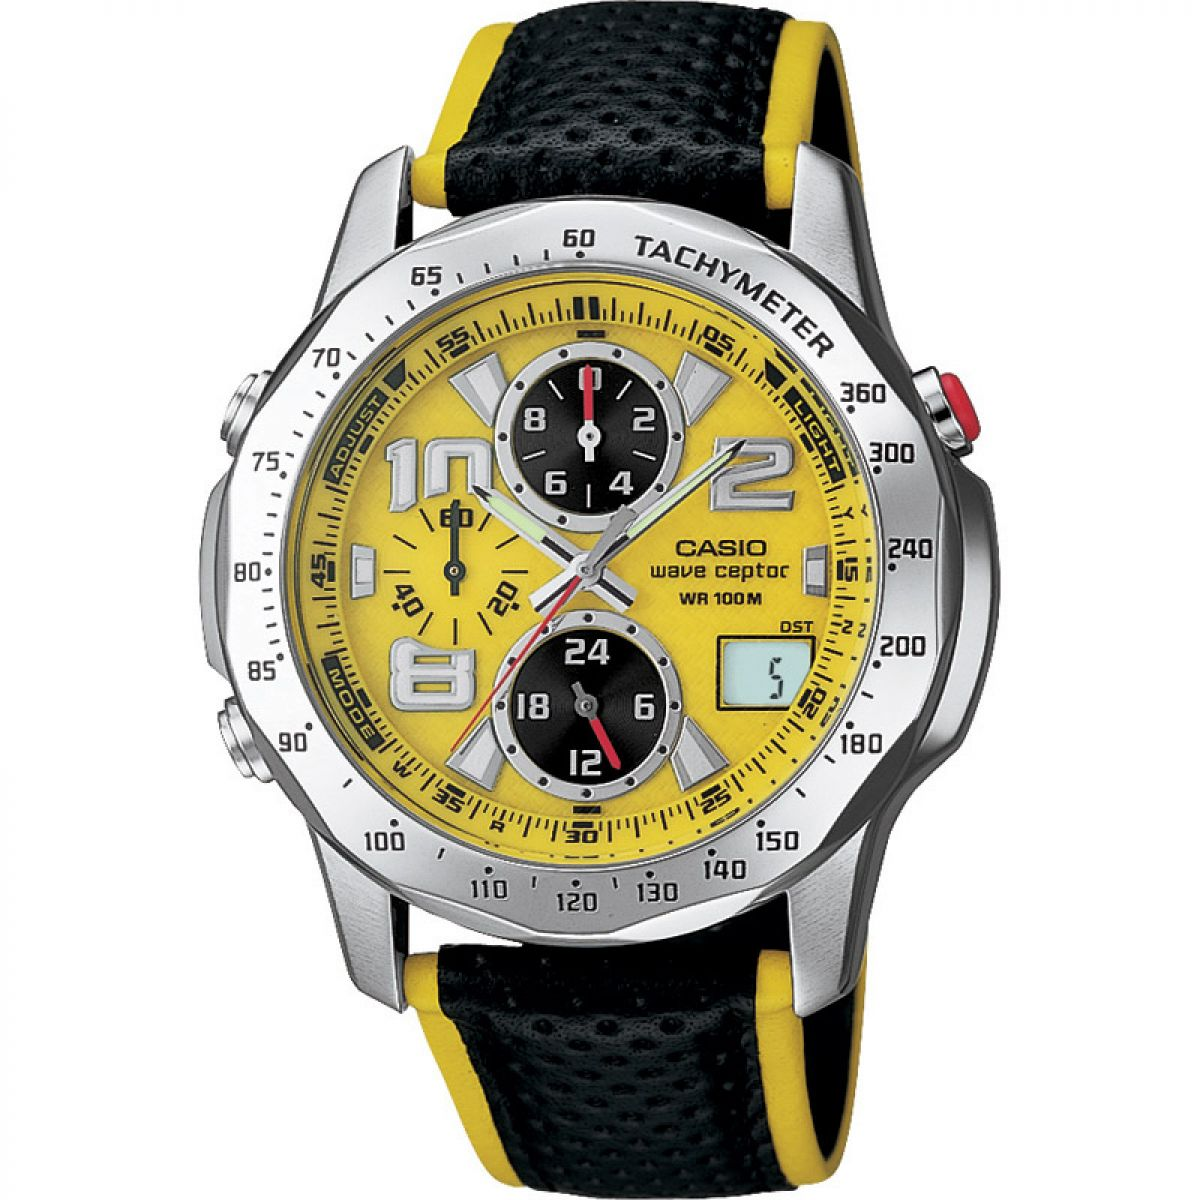 gents casio wave ceptor alarm chronograph watch wvq 550le 9aver rh watchshop com casio wave ceptor 4723 user manual casio wave ceptor 4723 user manual